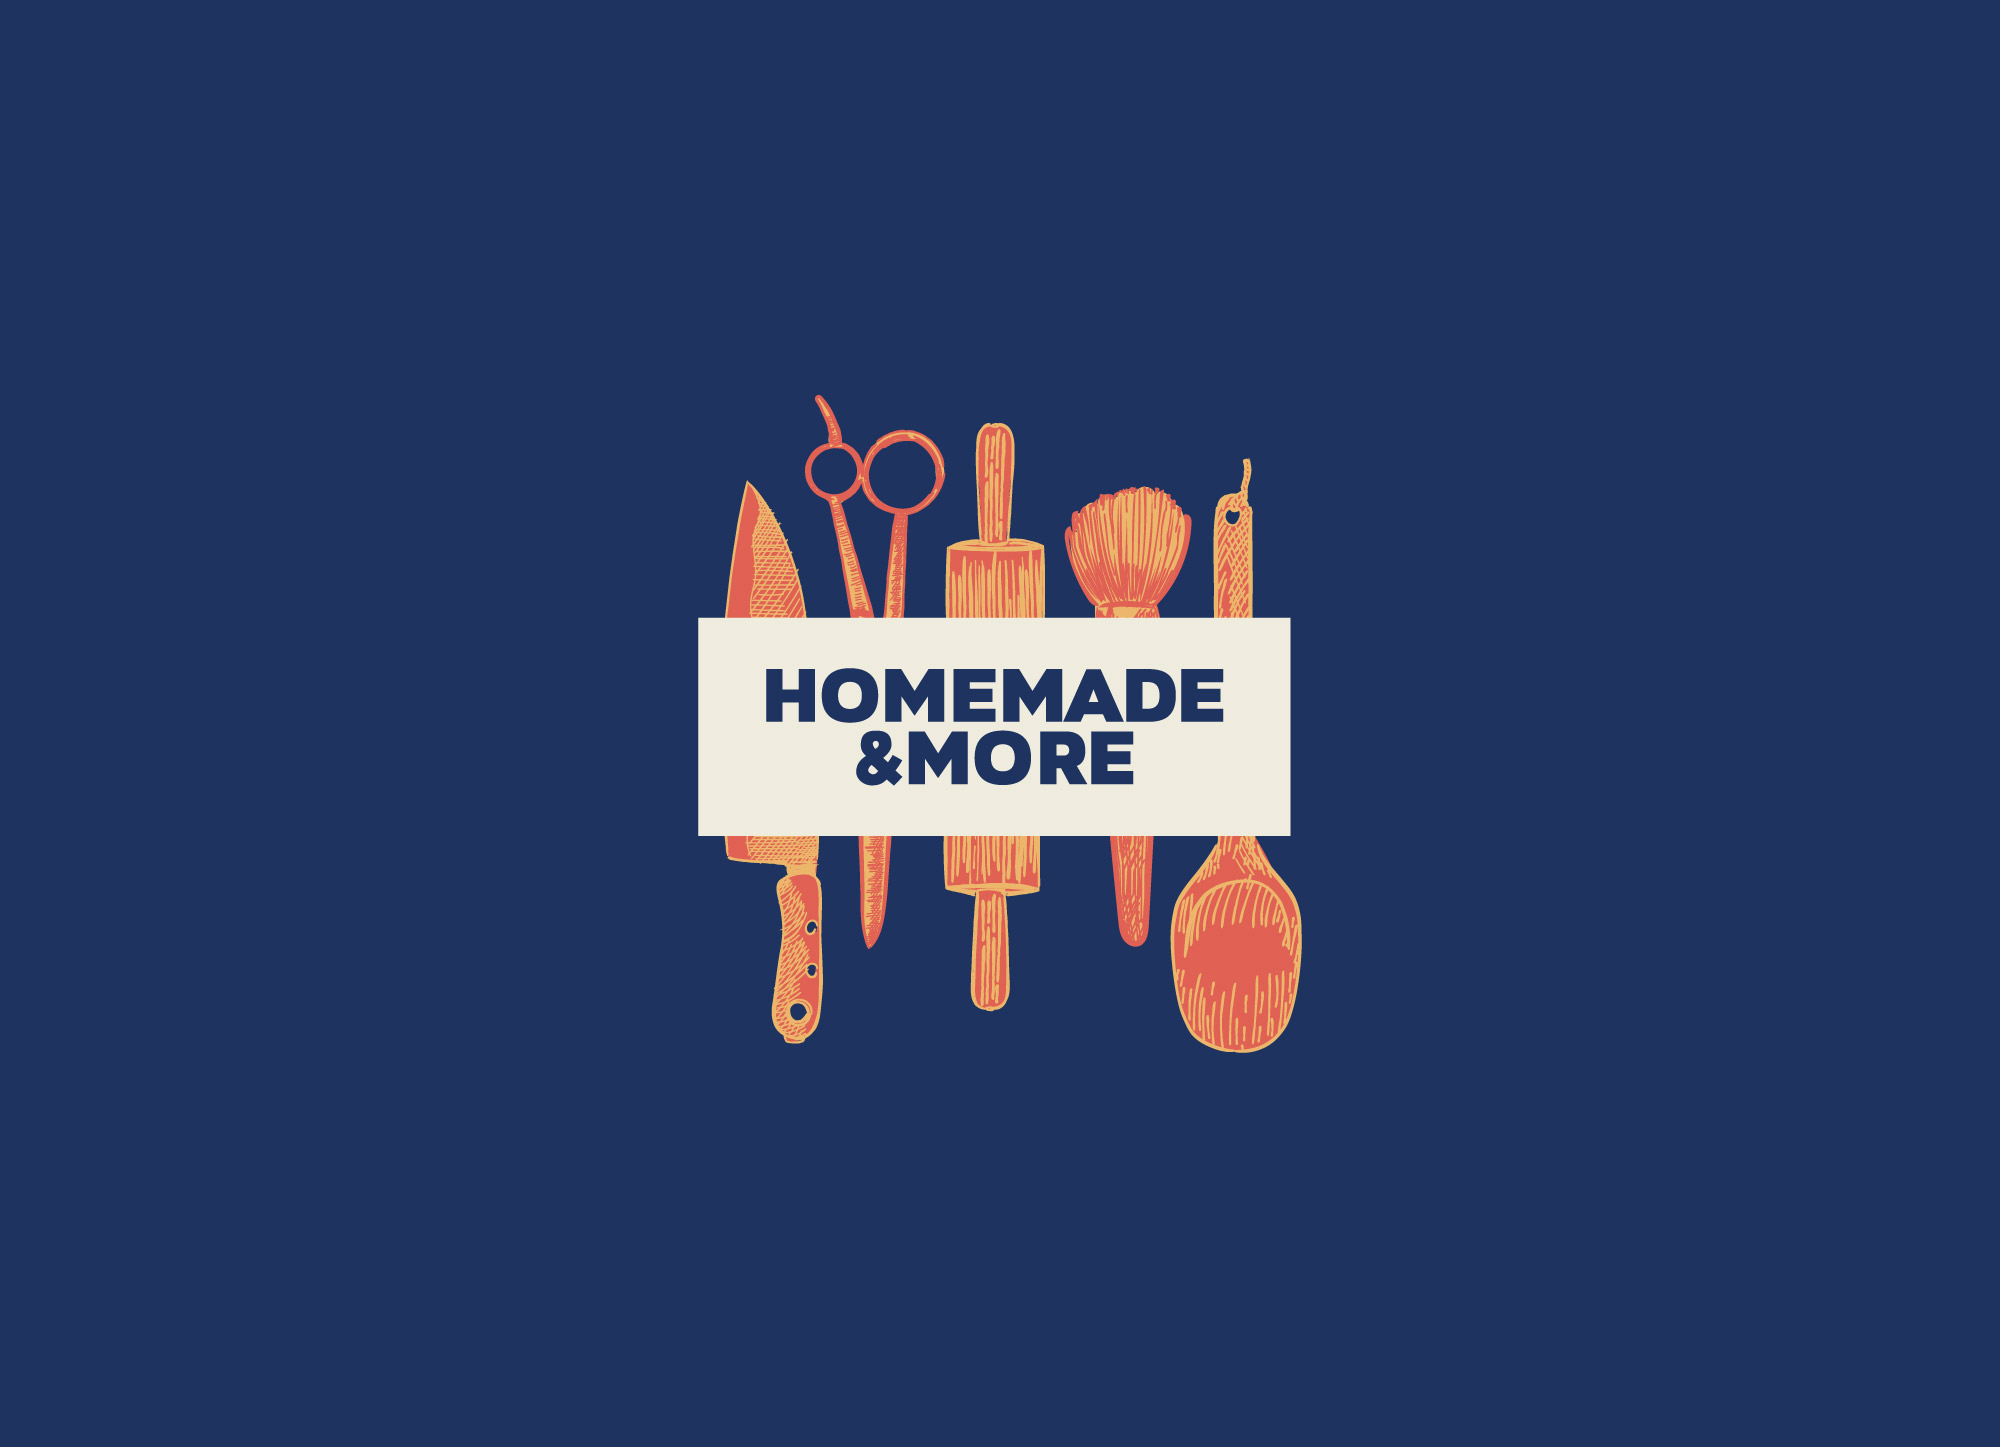 Homemade & More